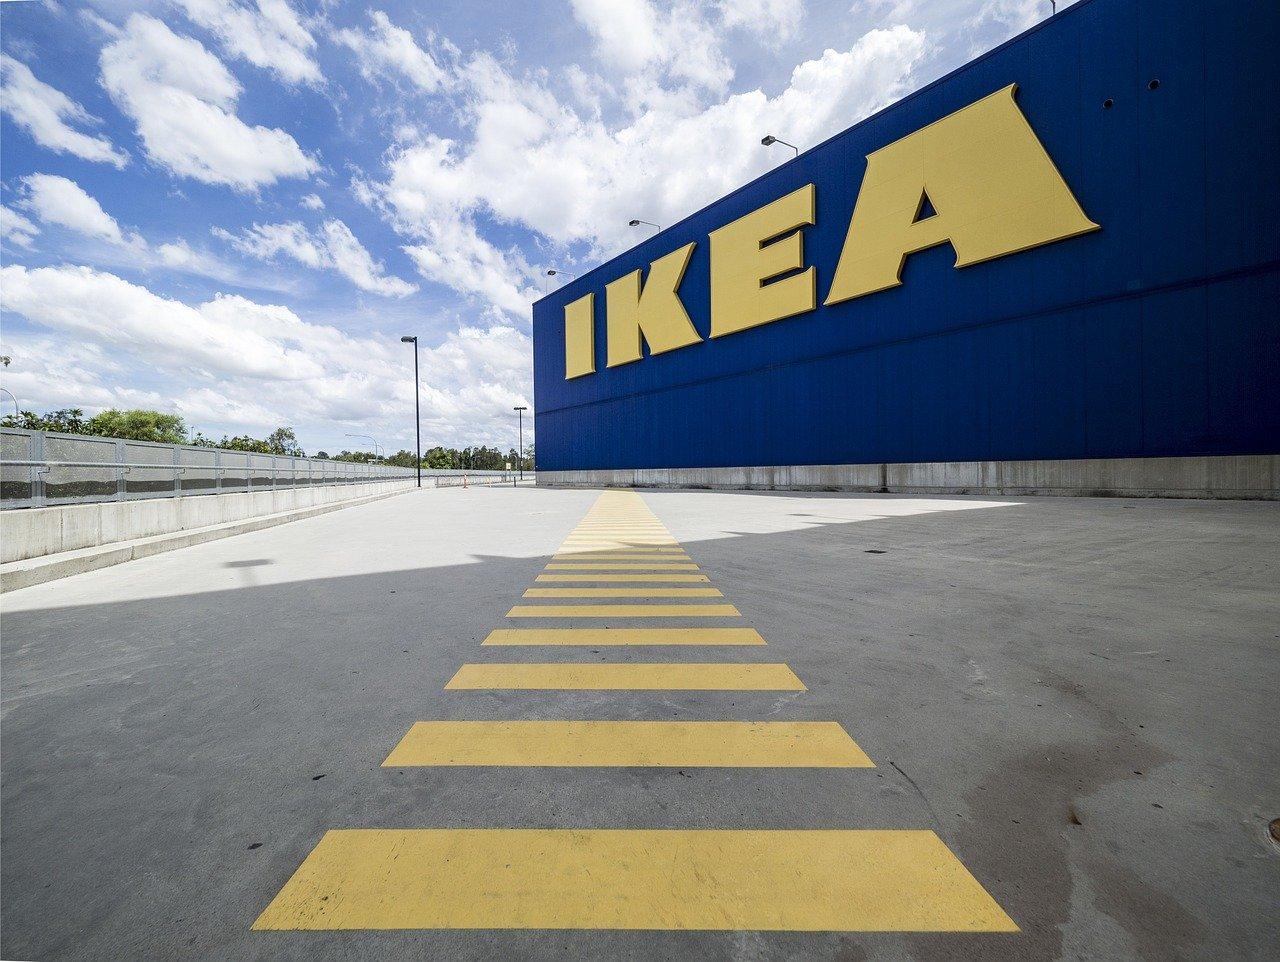 Ljubljanska Ikea jutri odpira svoja vrata